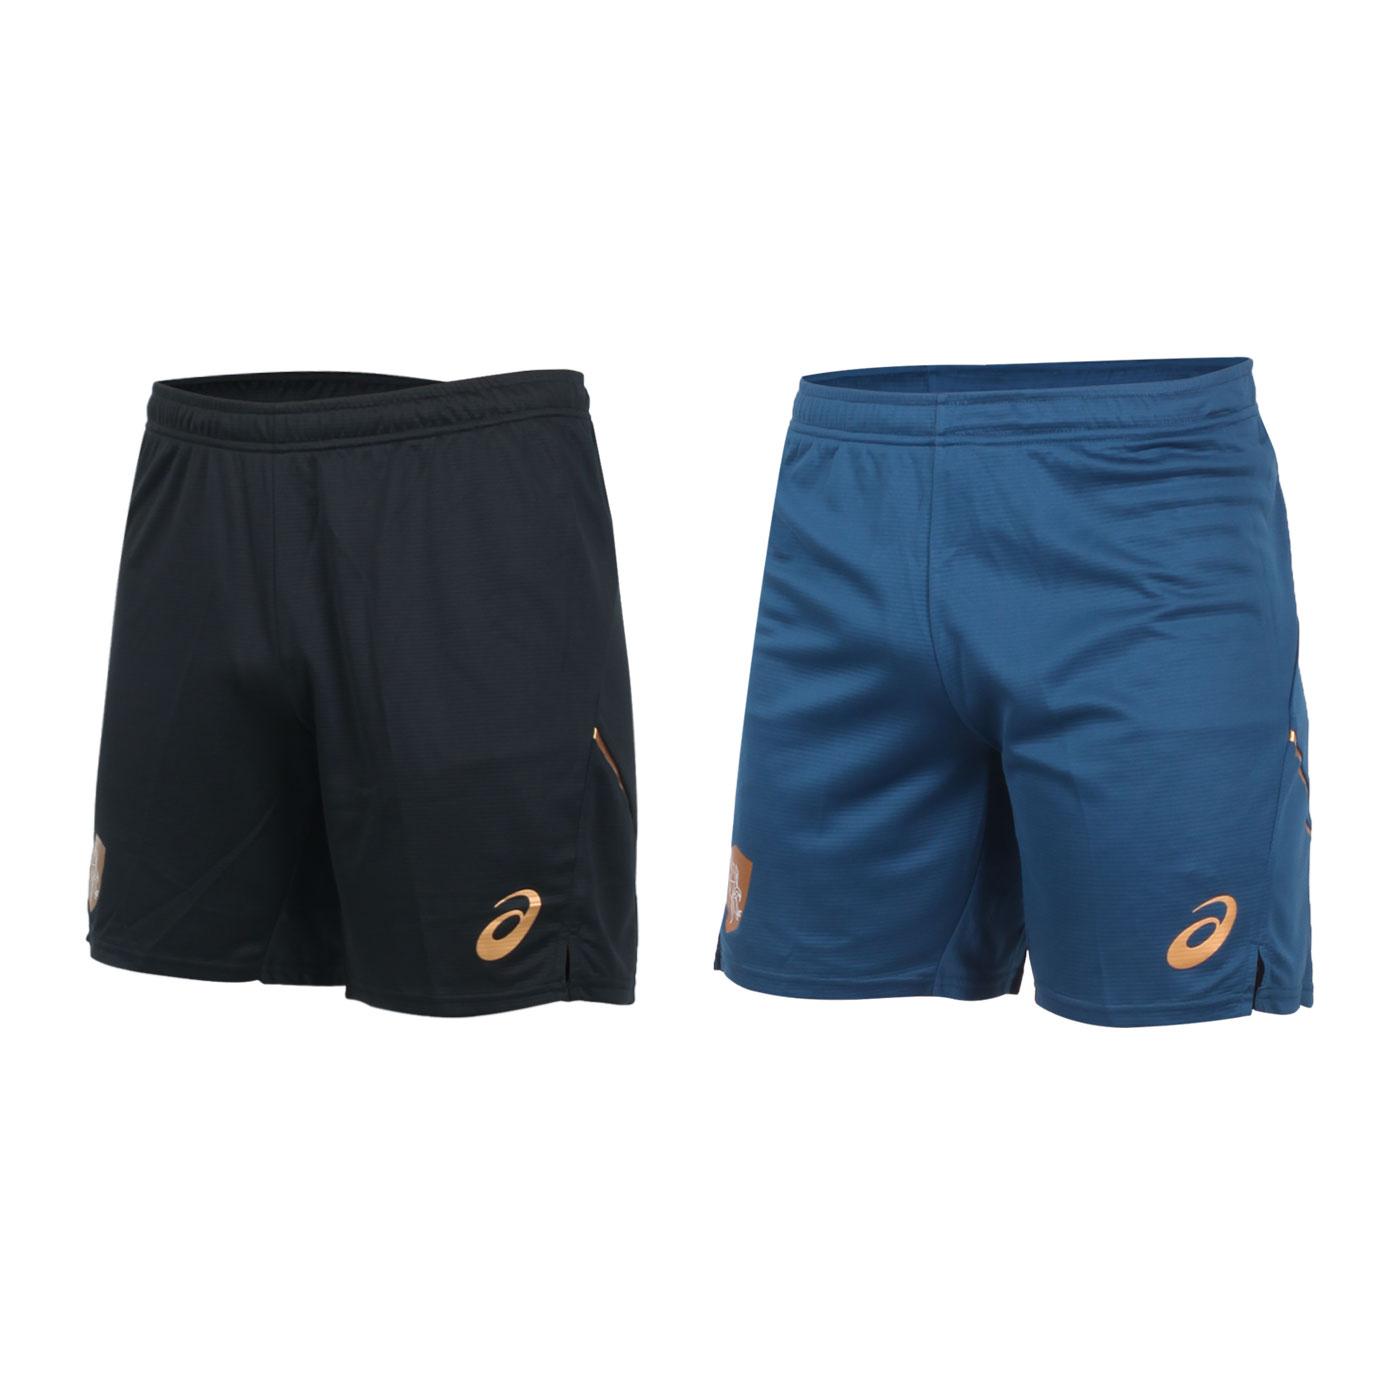 ASICS 男款針織短褲 2051A248-001